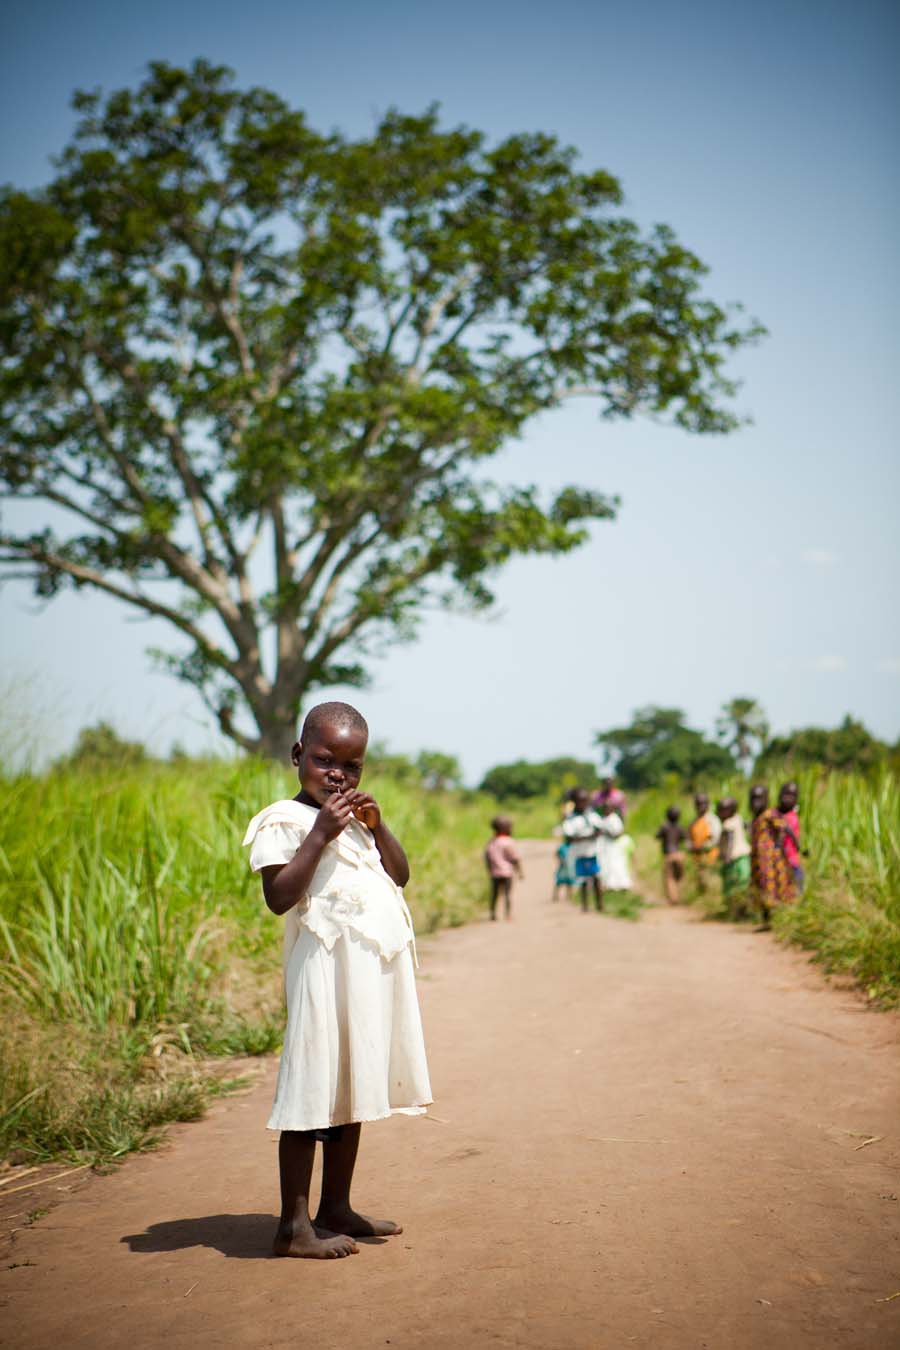 jessicadavisphotography.com | Jessica Davis Photography | Portrait Work in Uganda| Travel Photographer | World Event Photographs 2 (10).jpg